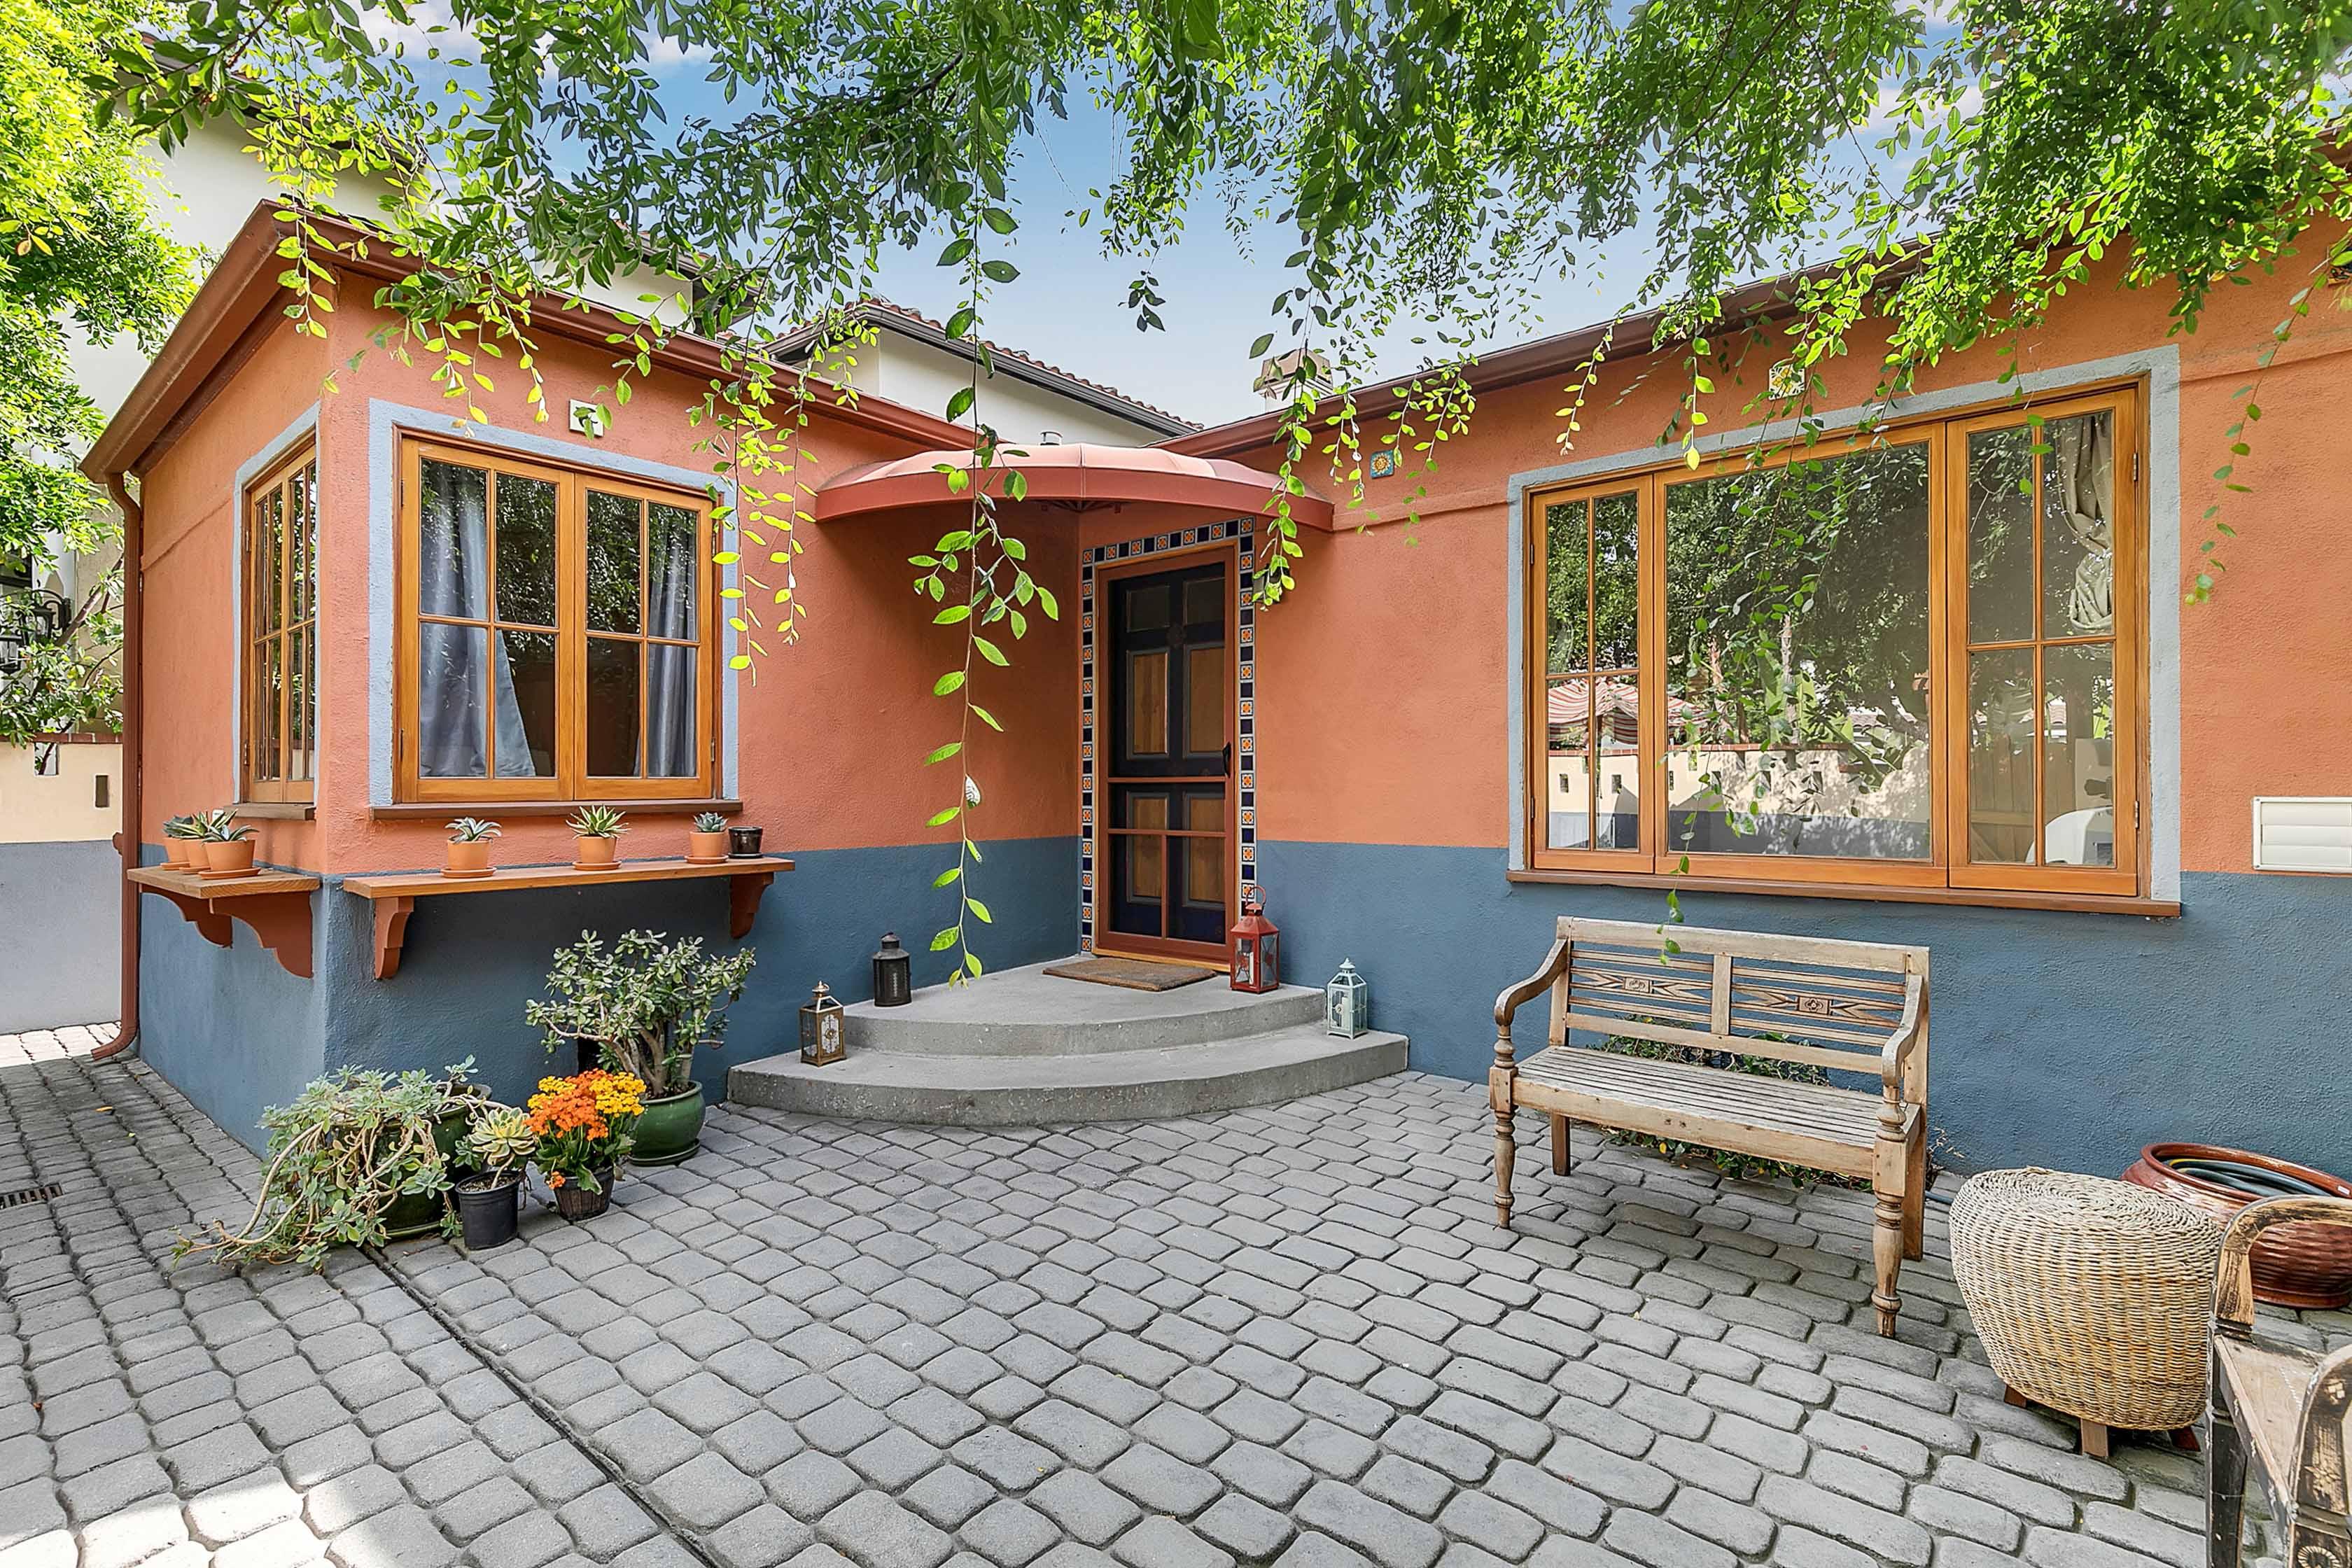 Drop-Dead Gorgeous Studio City 2BR/ 1BA Dream Home w/ Large Front & Backyards and Home-Veggie Garden!